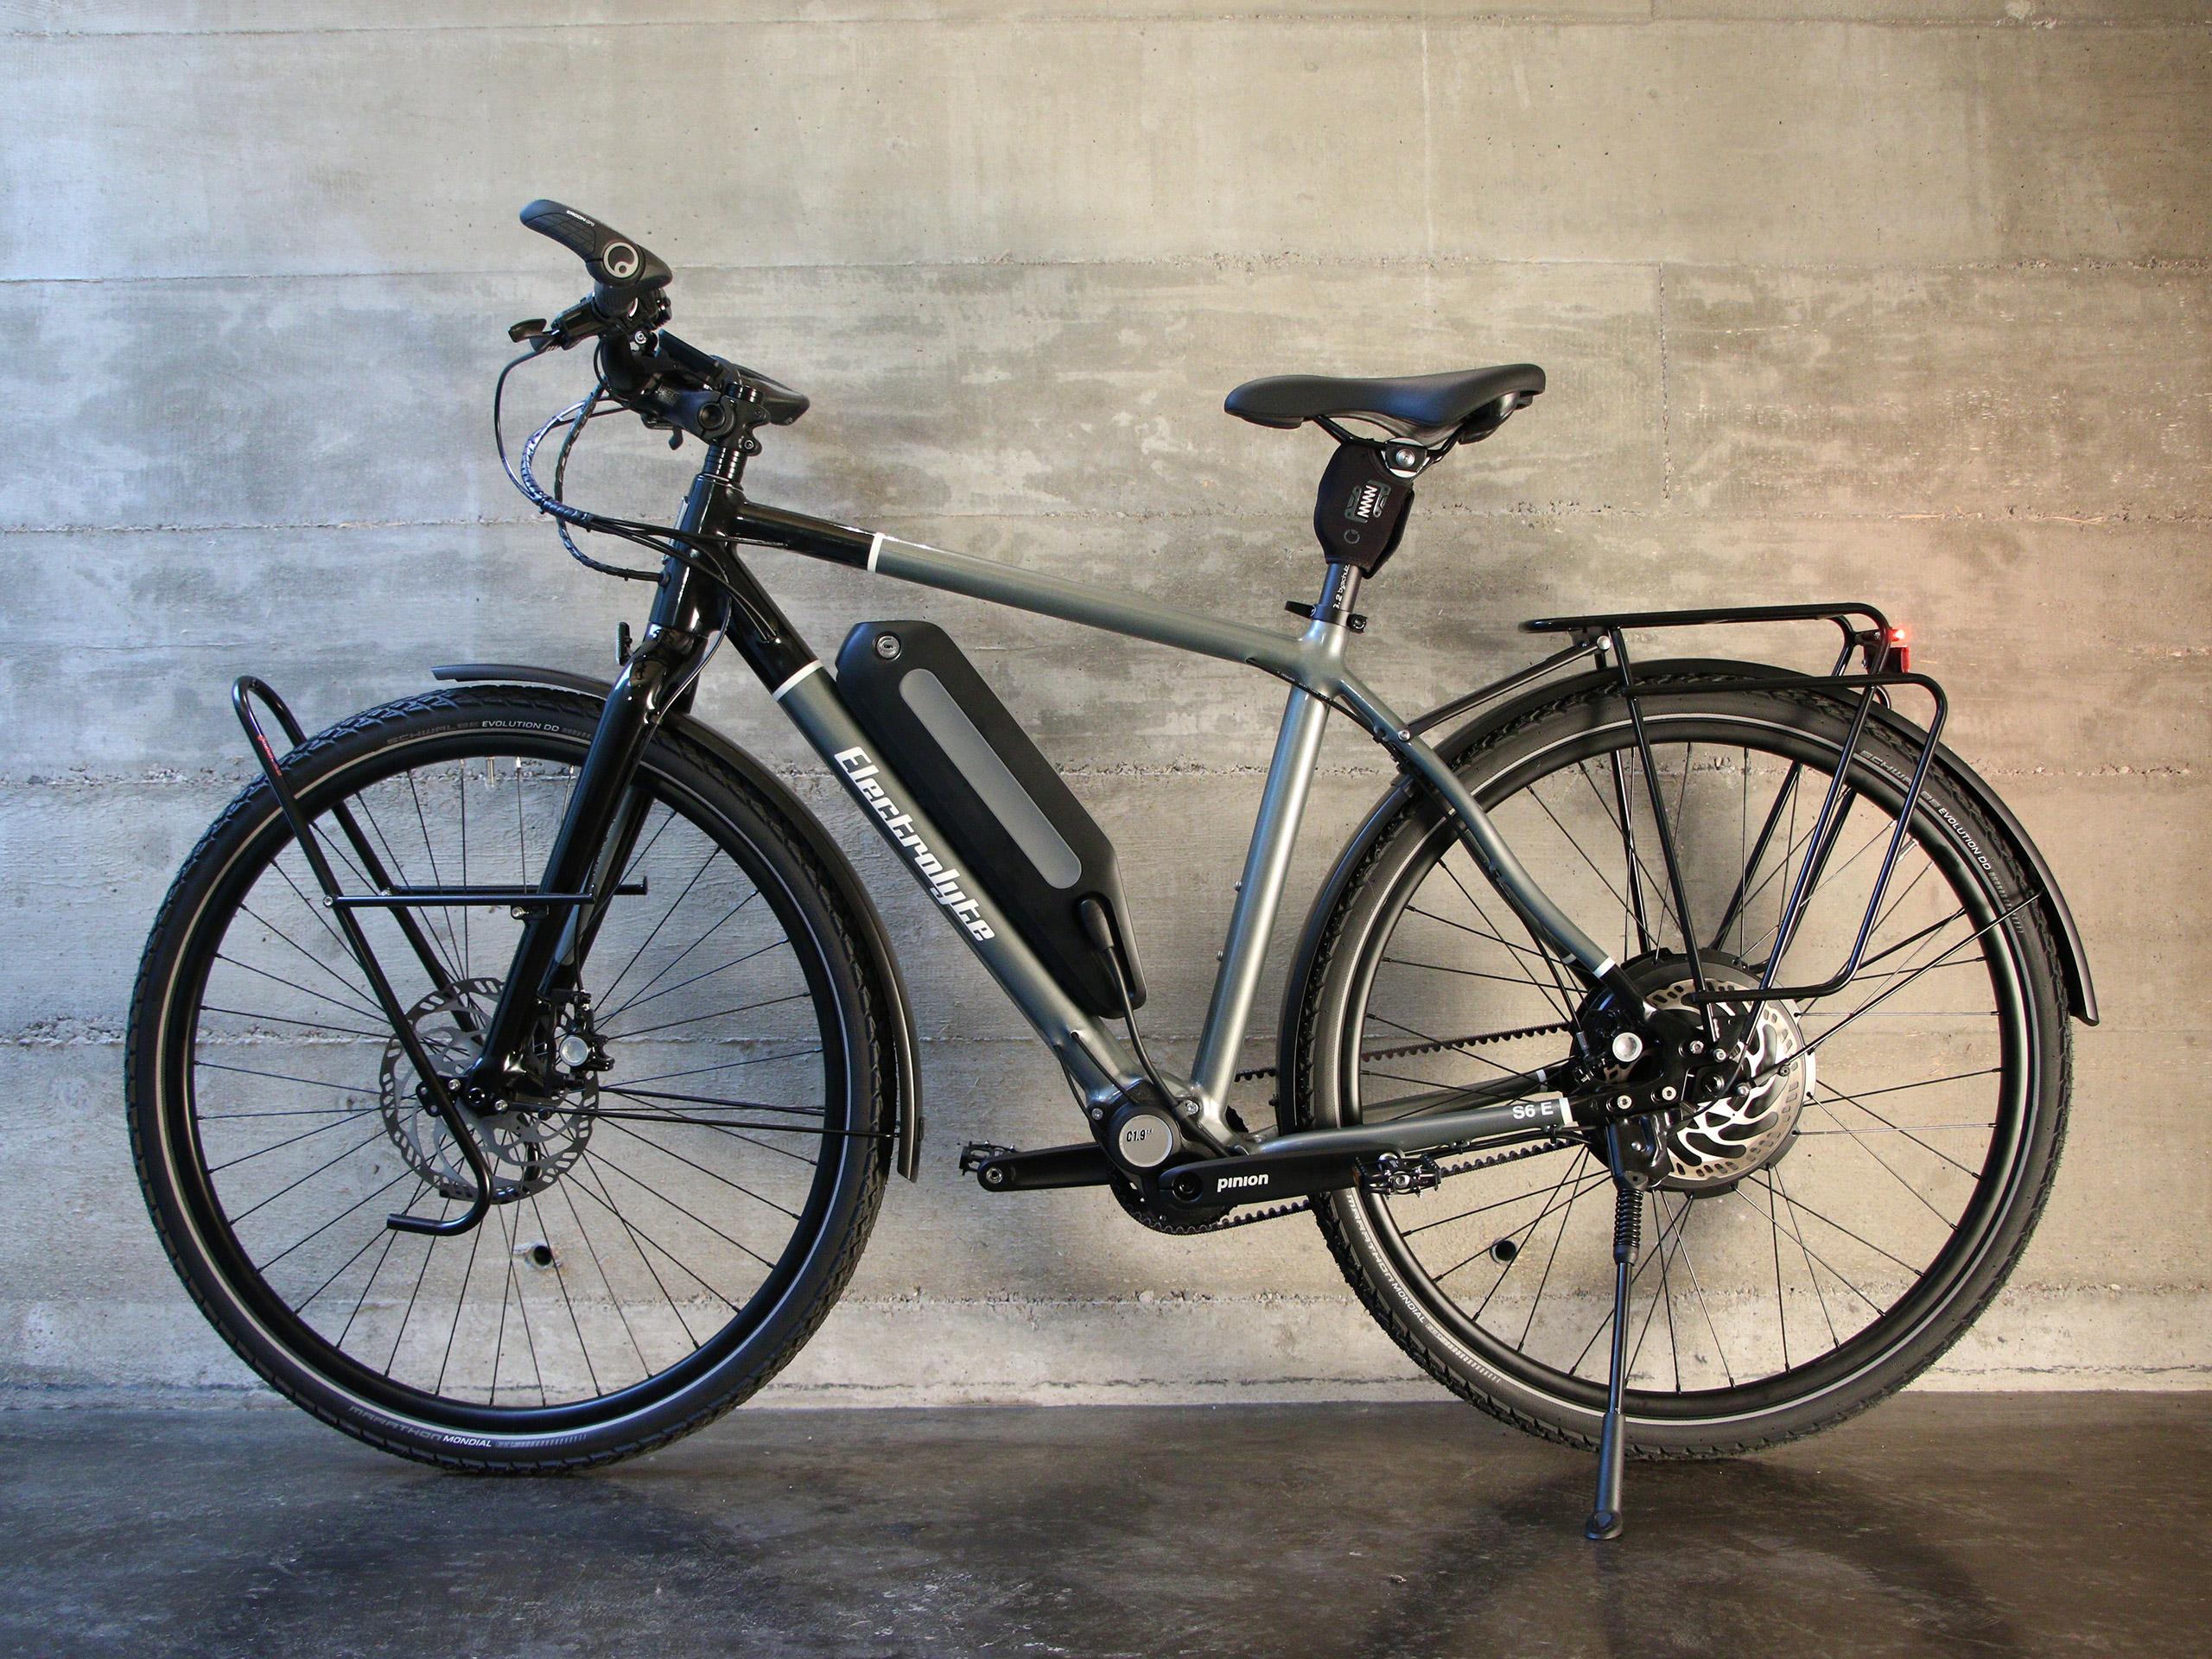 S6 E Travel - Bikepackking